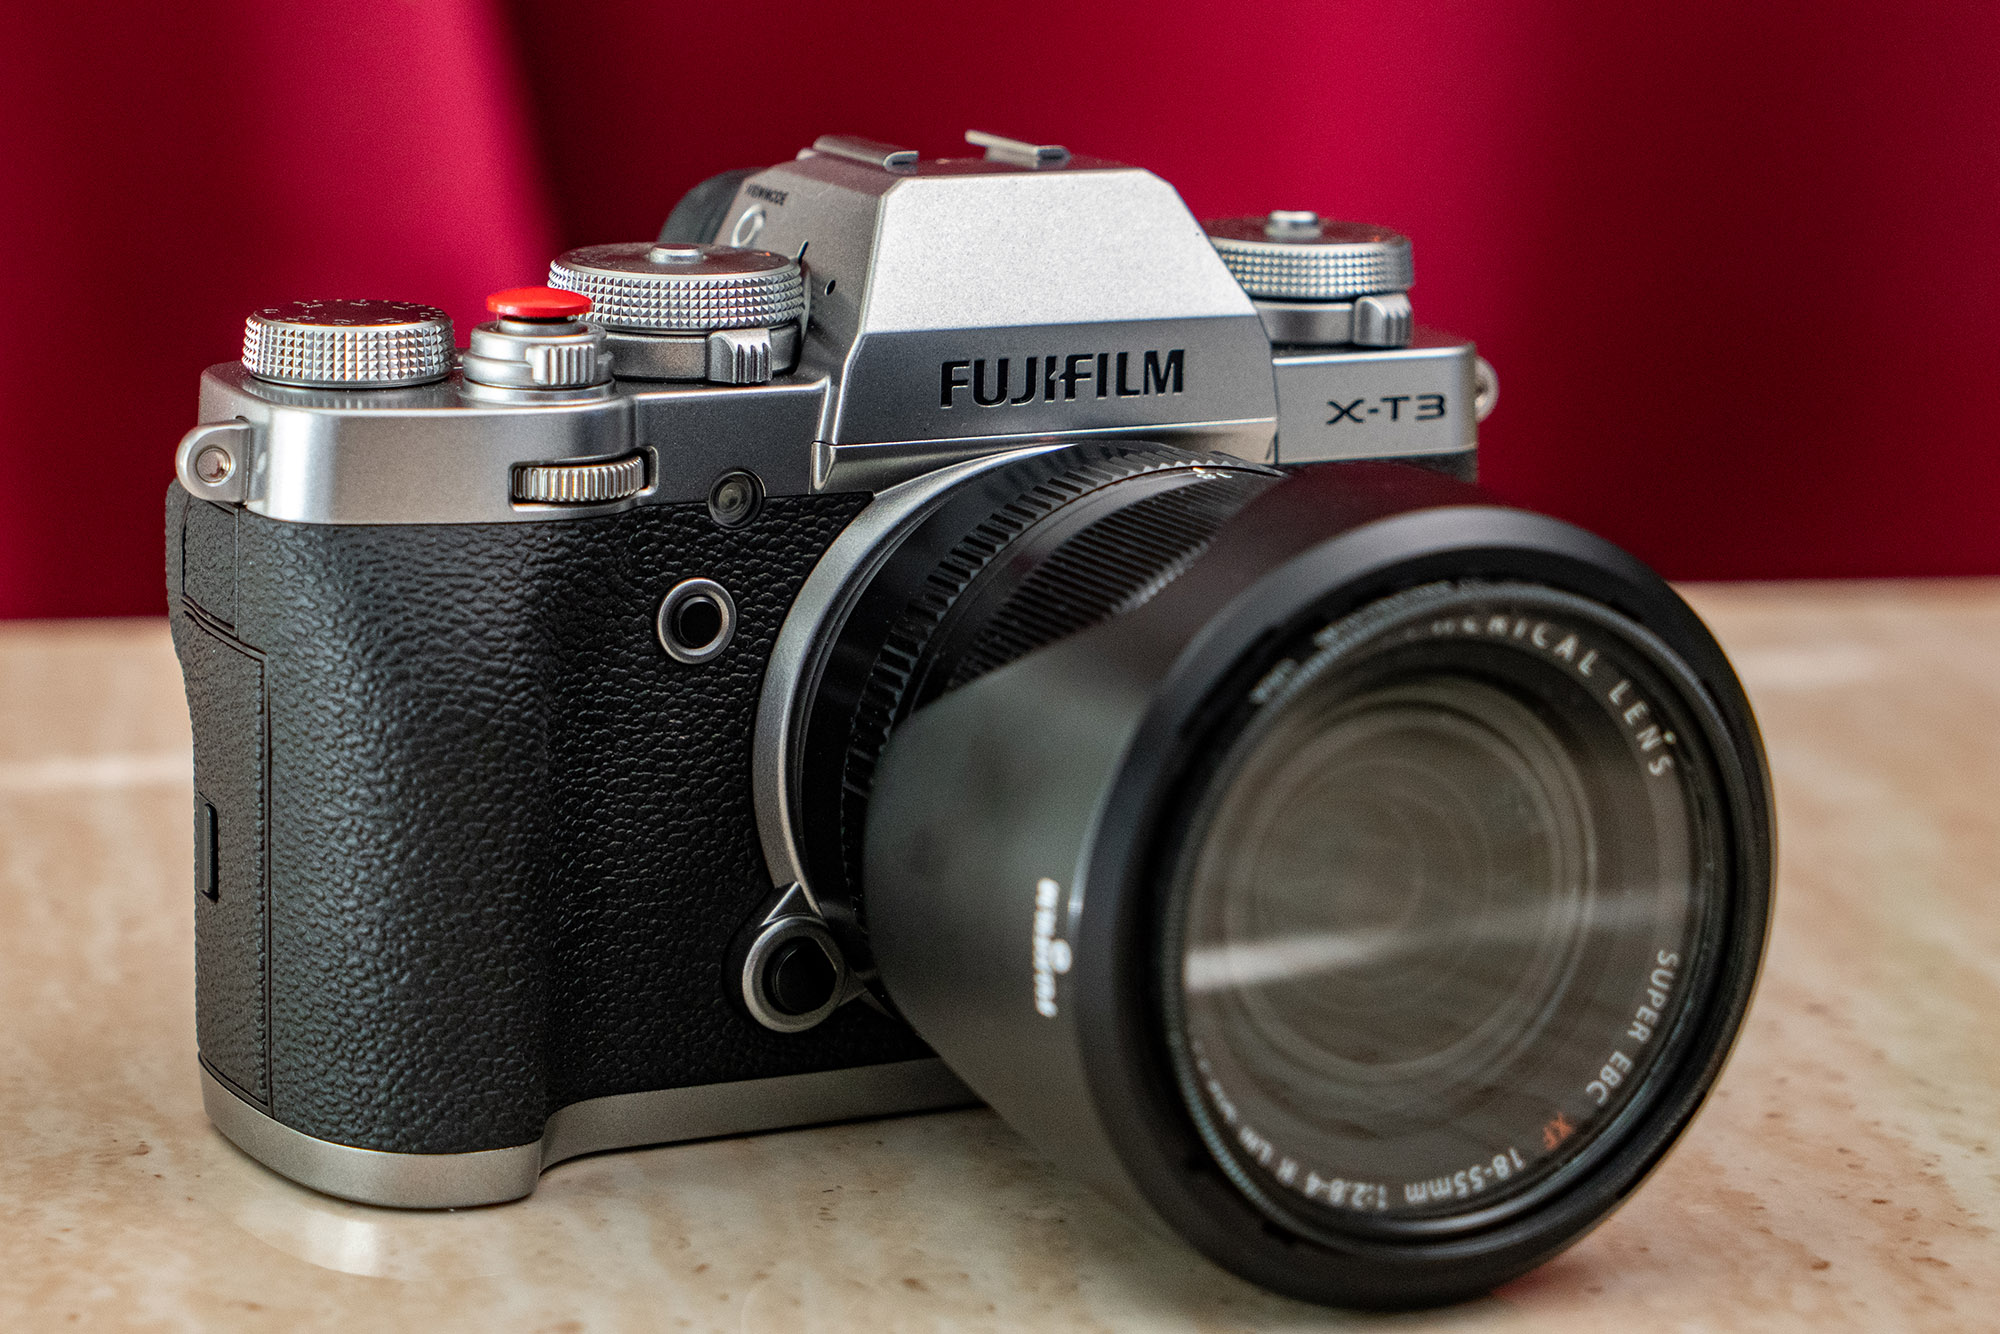 https://i1.wp.com/digital-photography-school.com/wp-content/uploads/2018/12/Pratt_Fujifim-XH1-XT3_007.jpg?resize=2000%2C1334&ssl=1